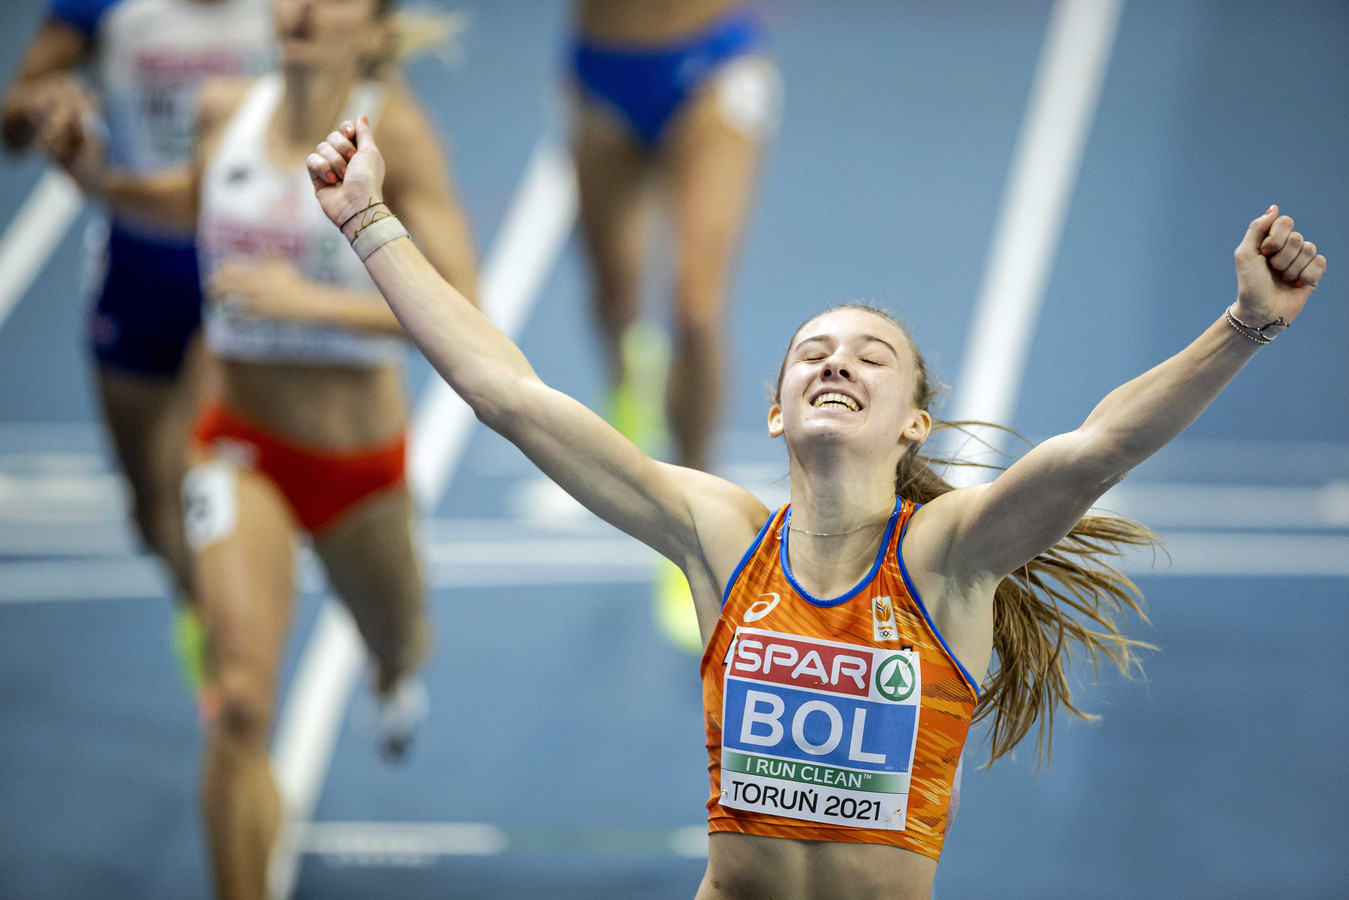 Femke Bol wint EK-goud op de 400 meter in de Poolse stad Torun.